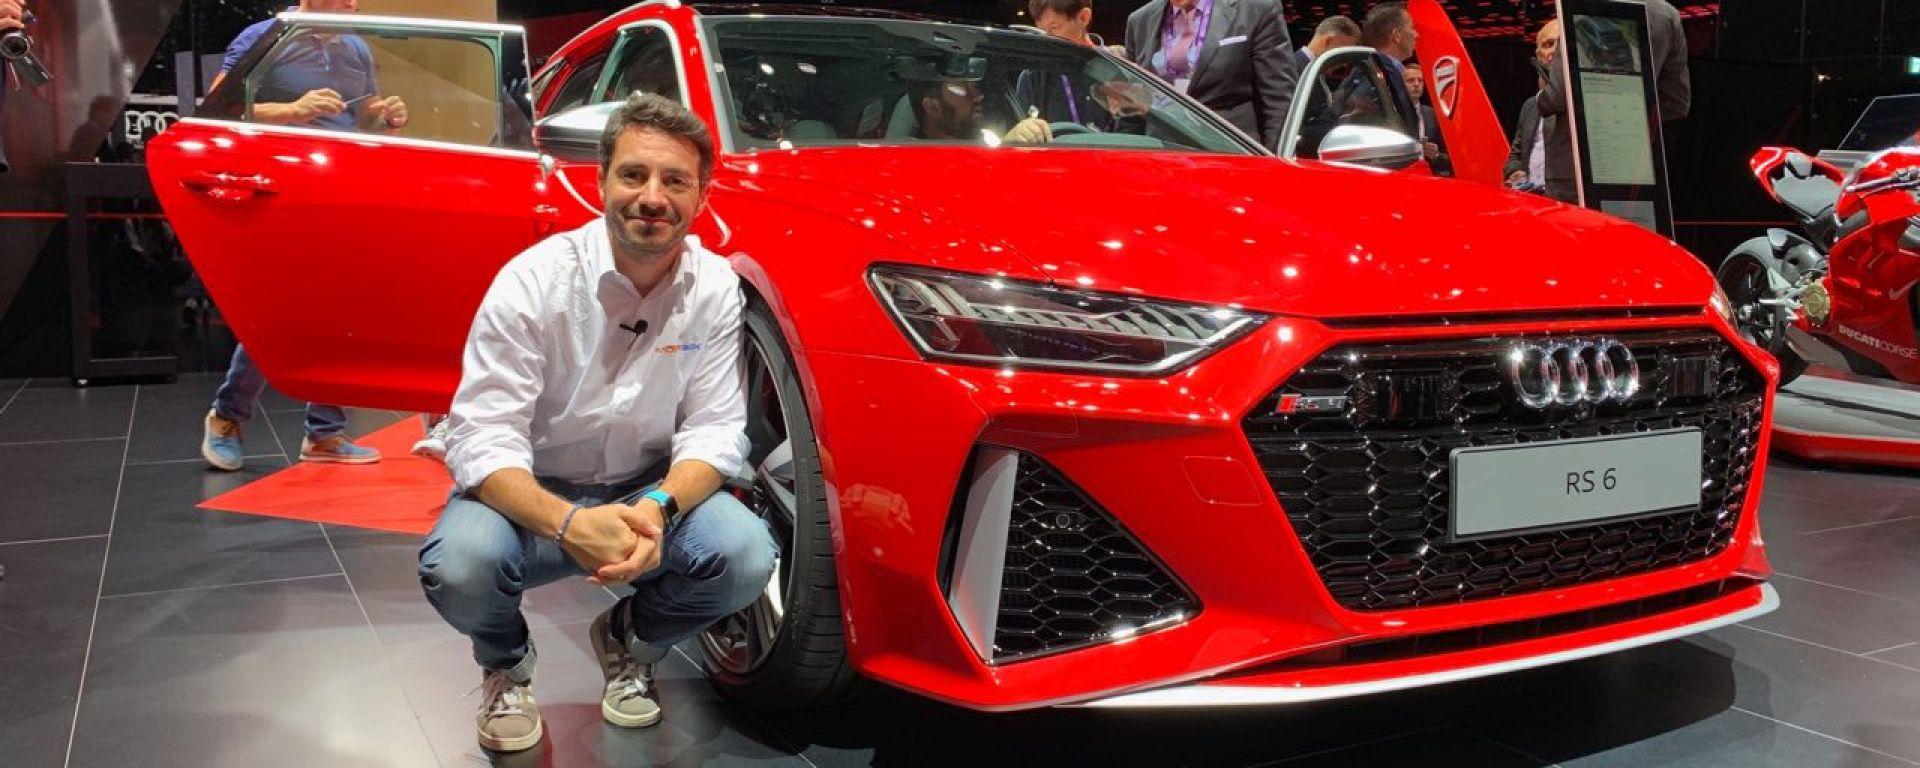 Nuova Audi RS6 Avant a Francoforte 2019